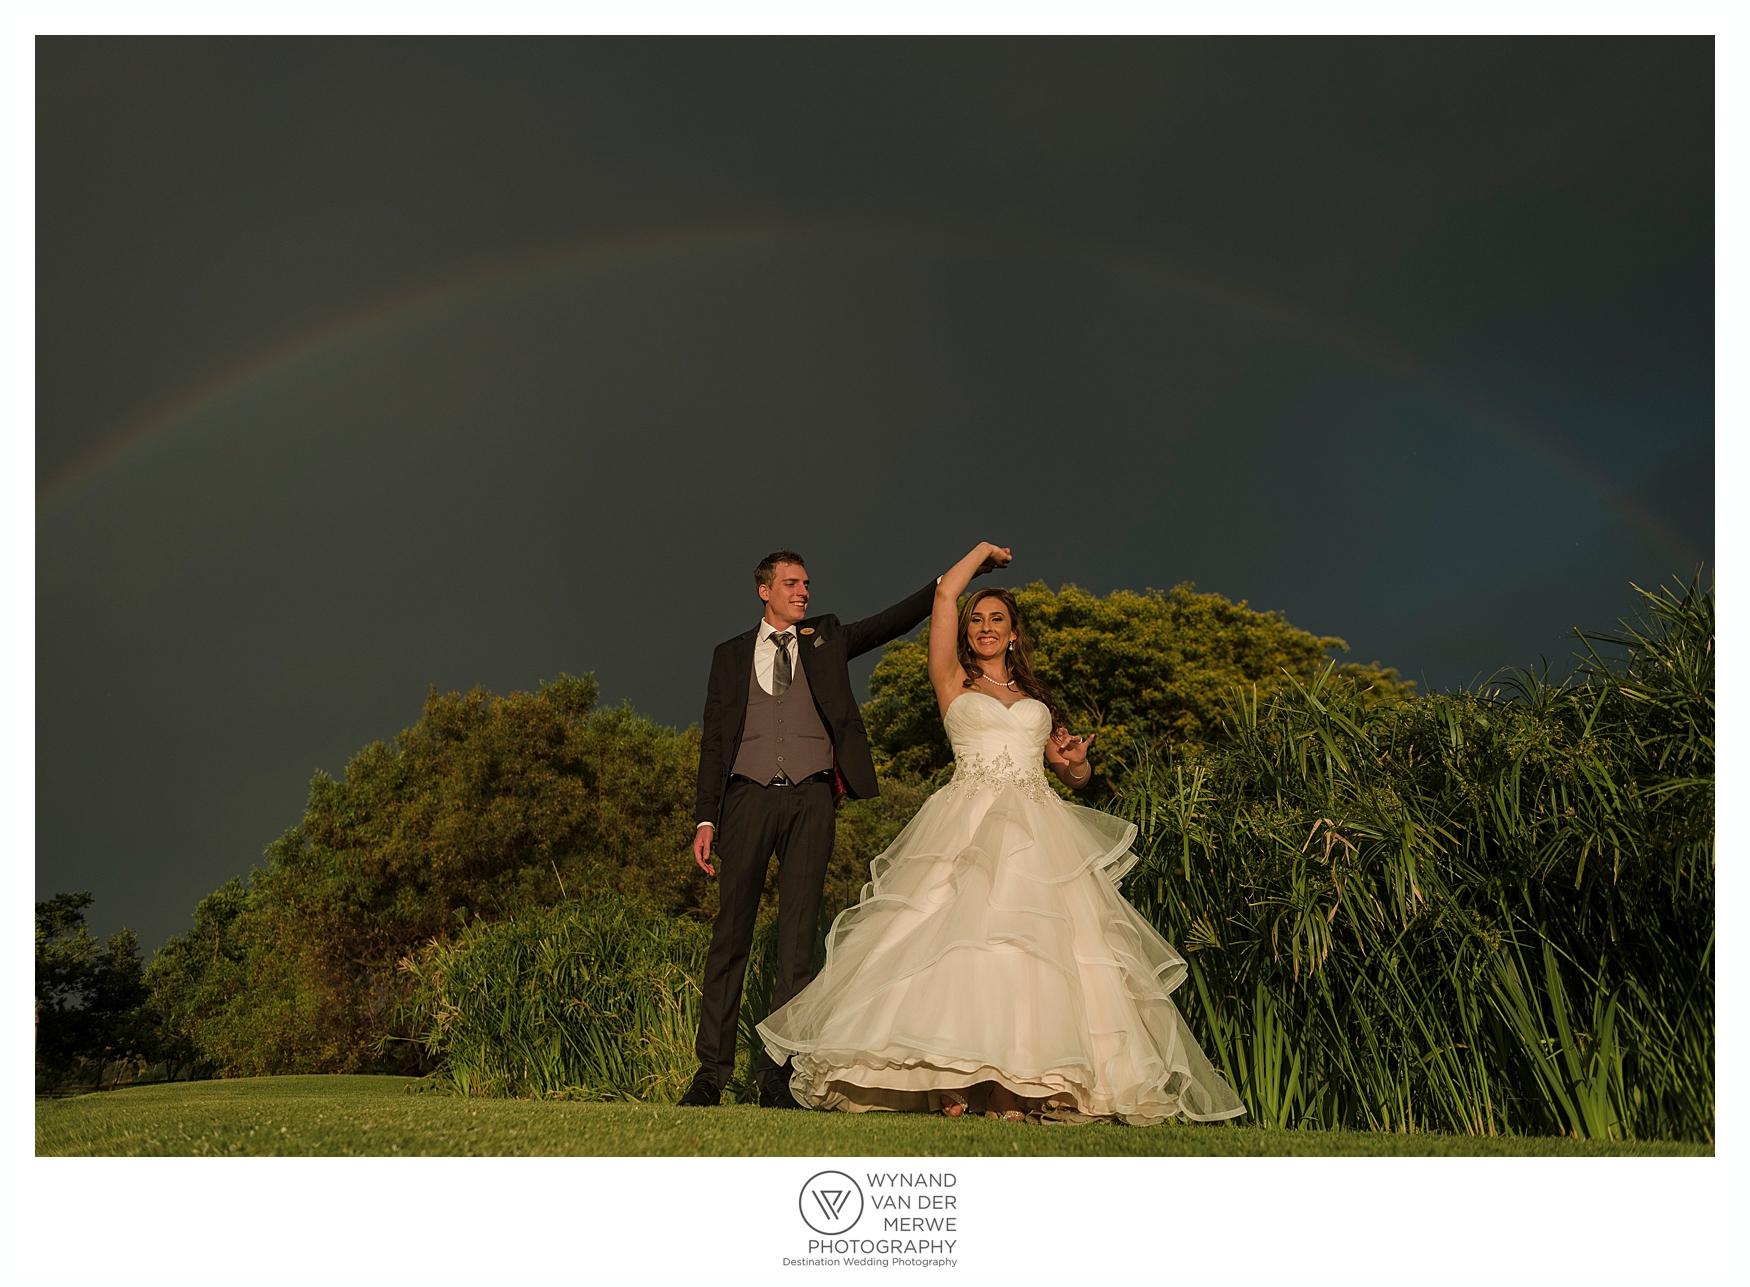 Wynandvandermerwe ryan natalia wedding photography cradle valley guesthouse gauteng-478.jpg